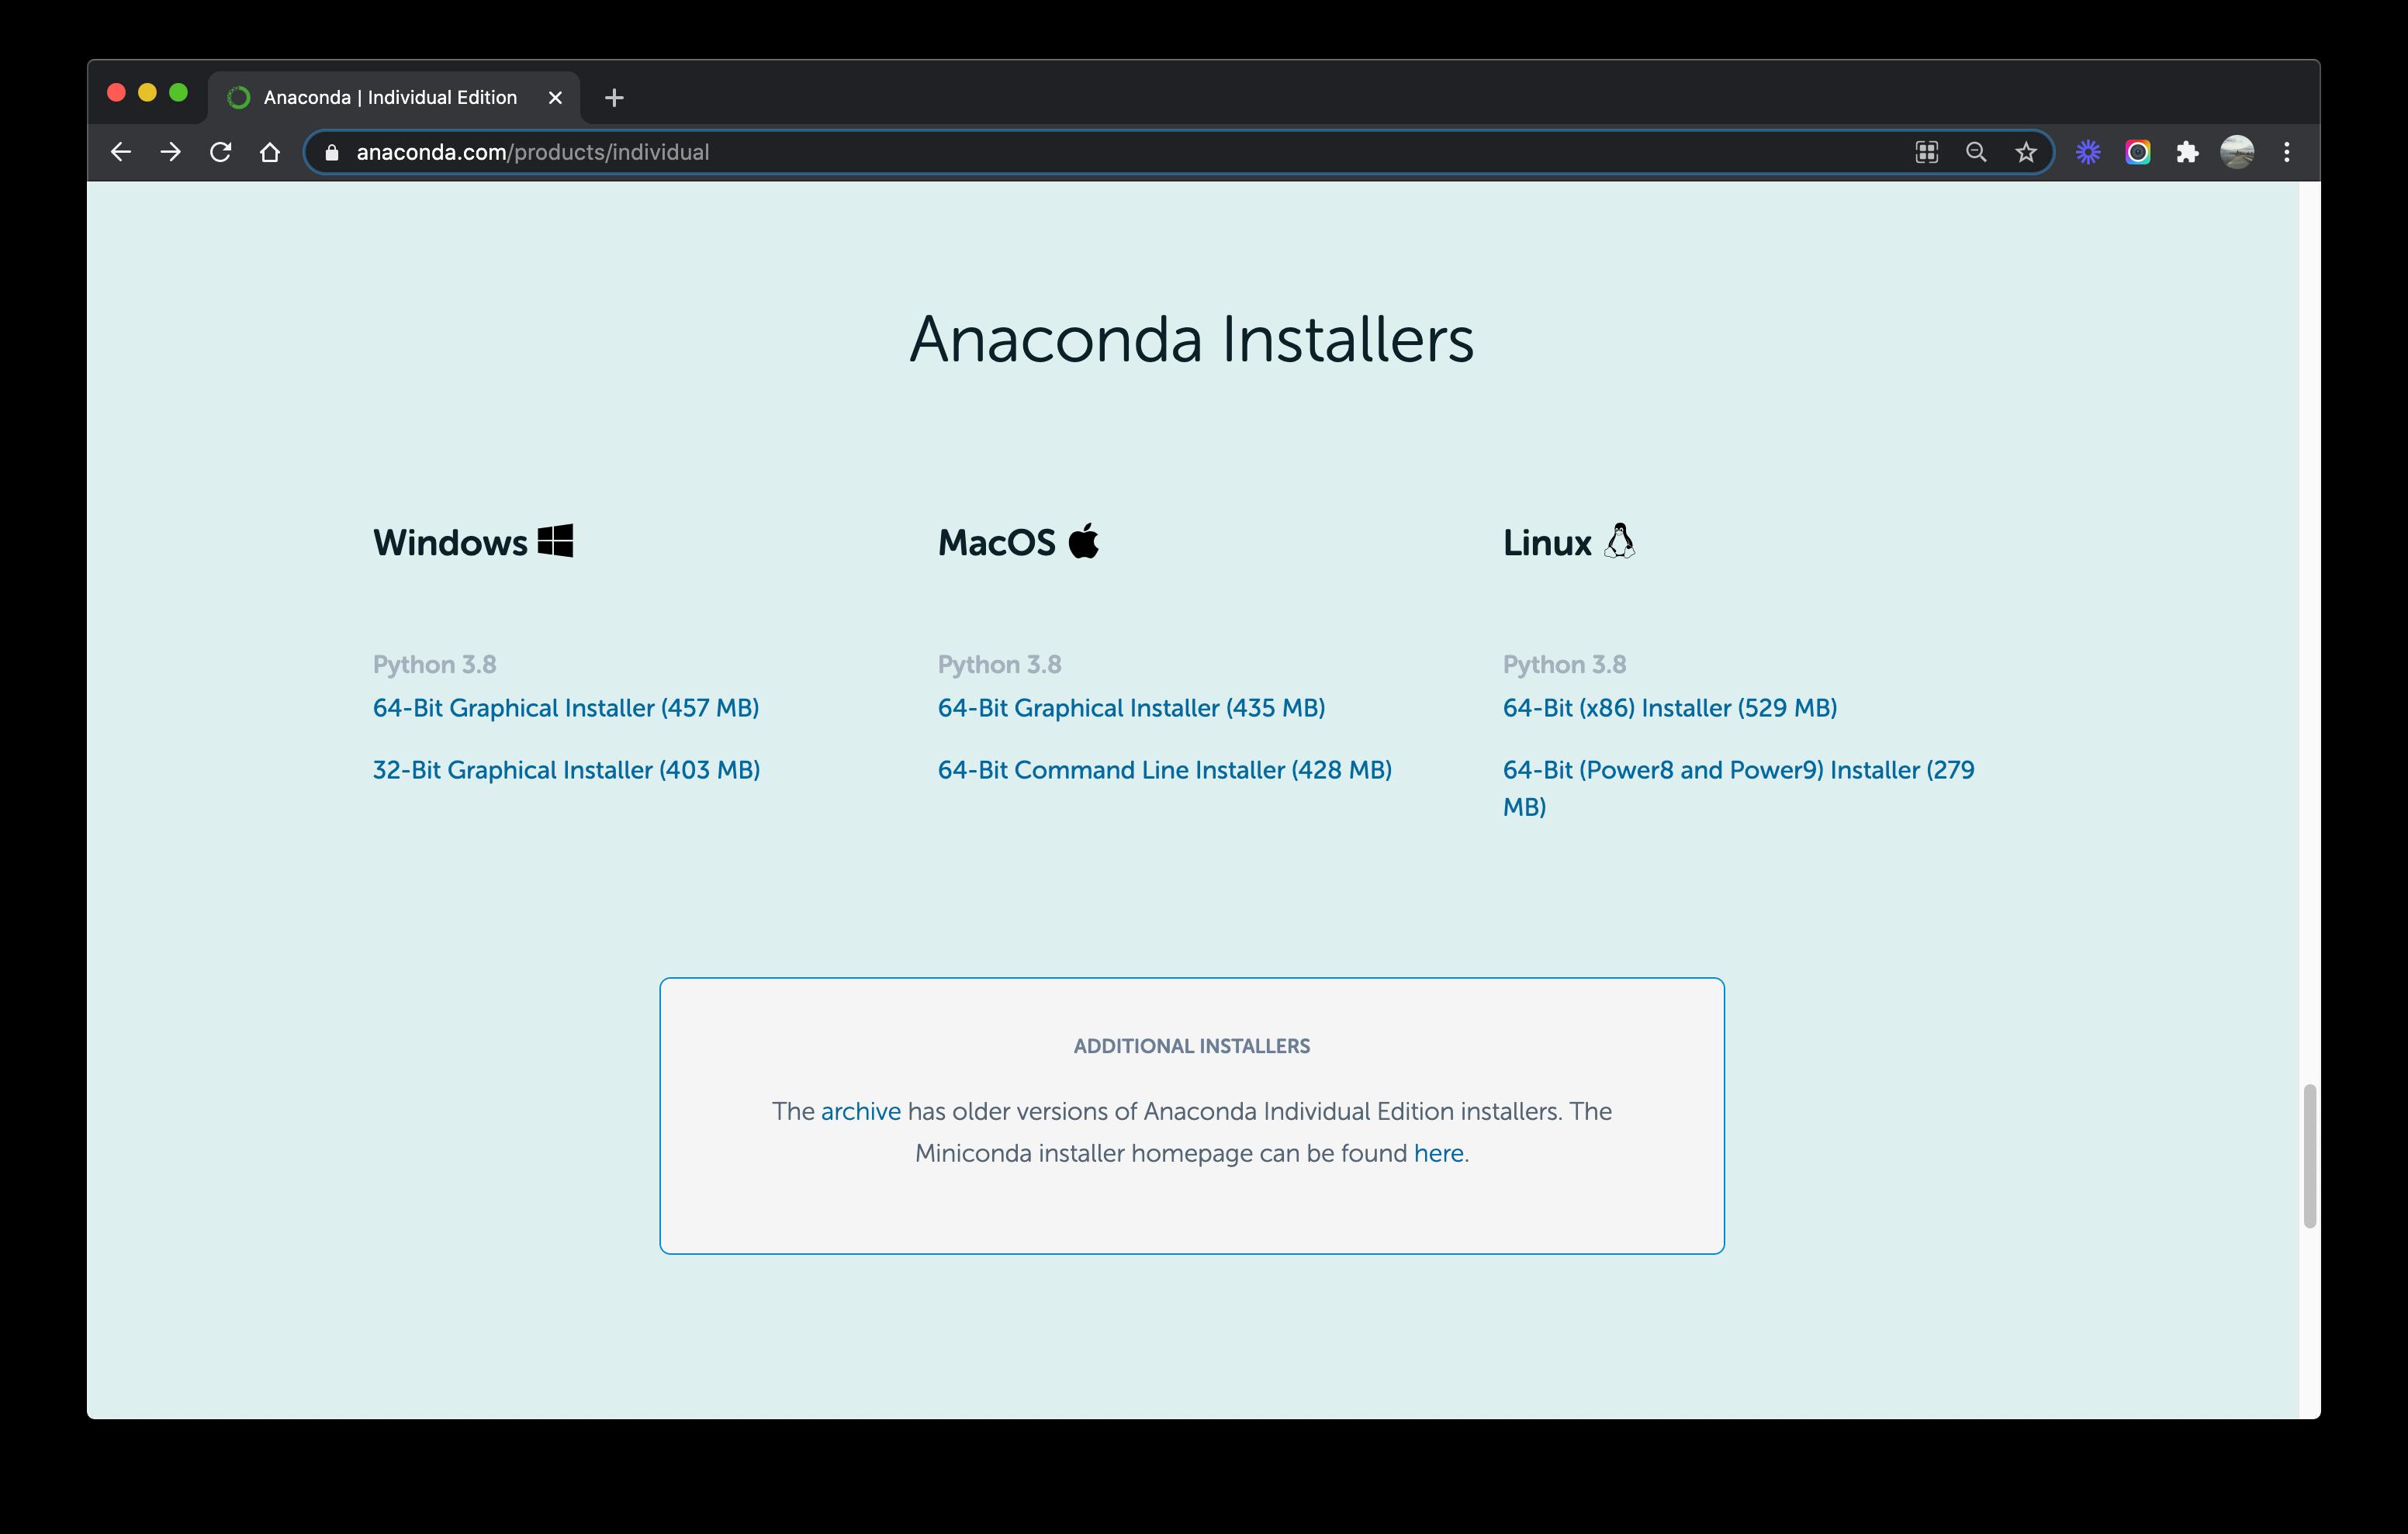 Anaconda installers screenshot